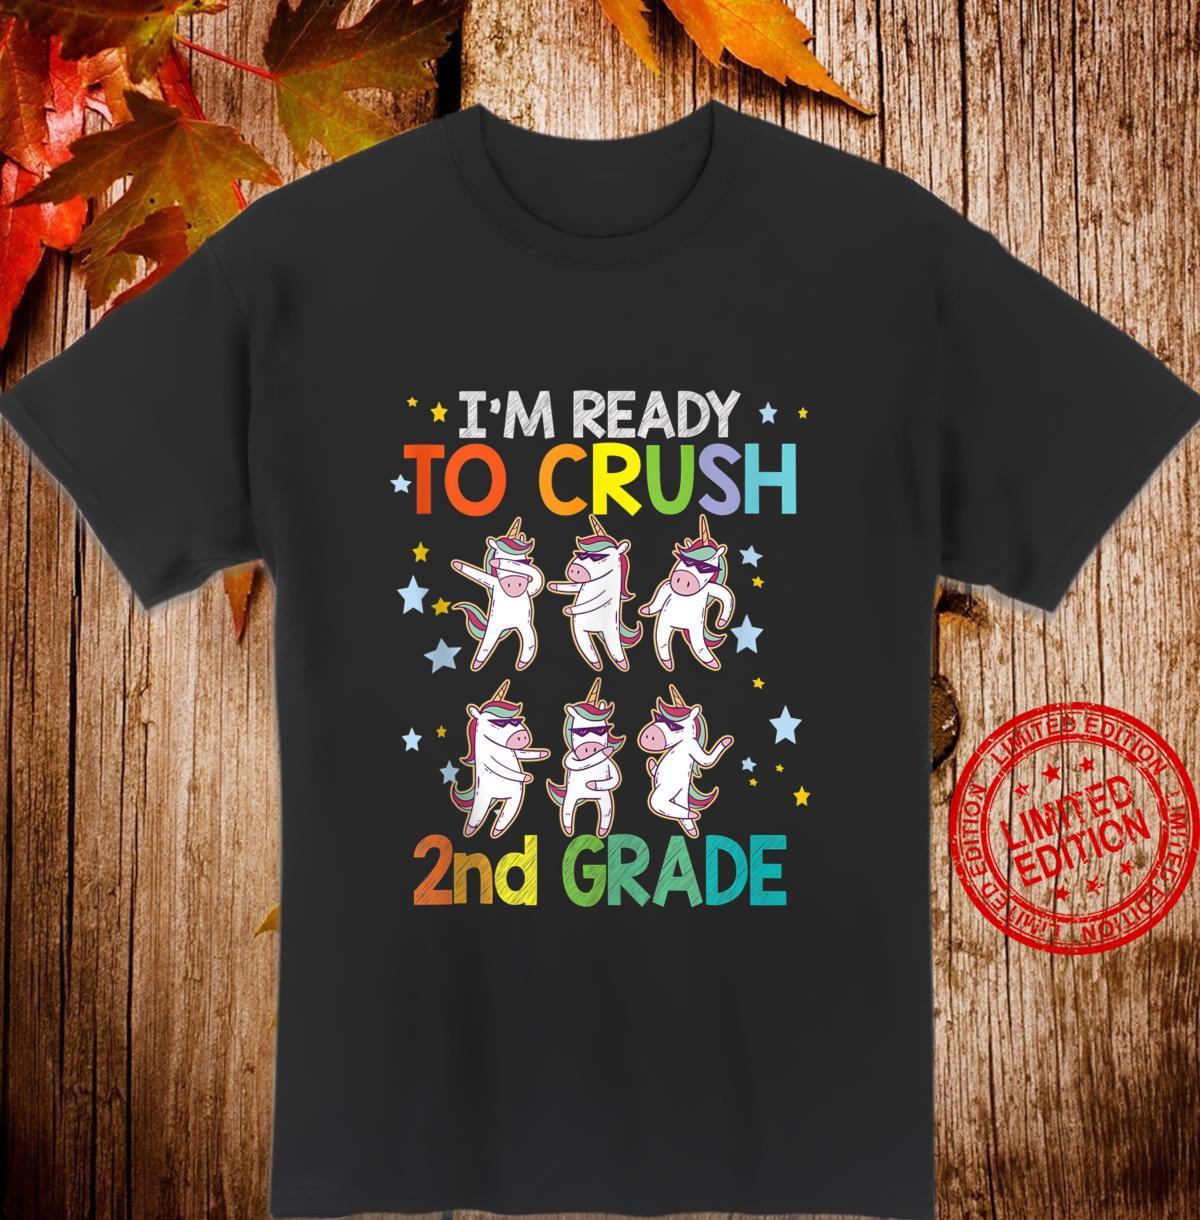 I'm ready to crush 2nd grade dancing unicorn Idea Shirt